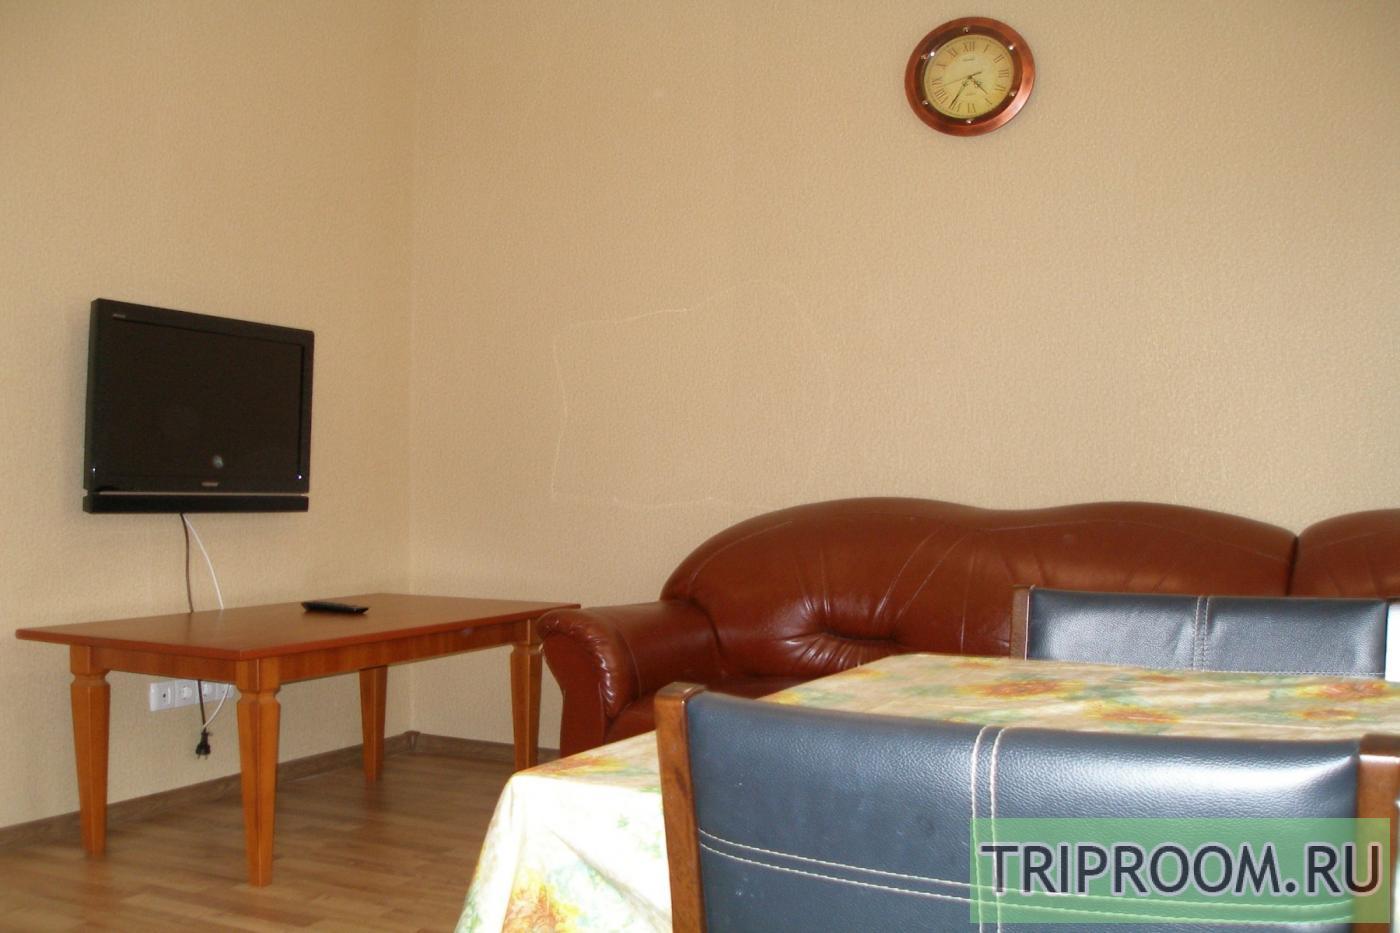 3-комнатная квартира посуточно (вариант № 34537), ул. Чехова улица, фото № 4